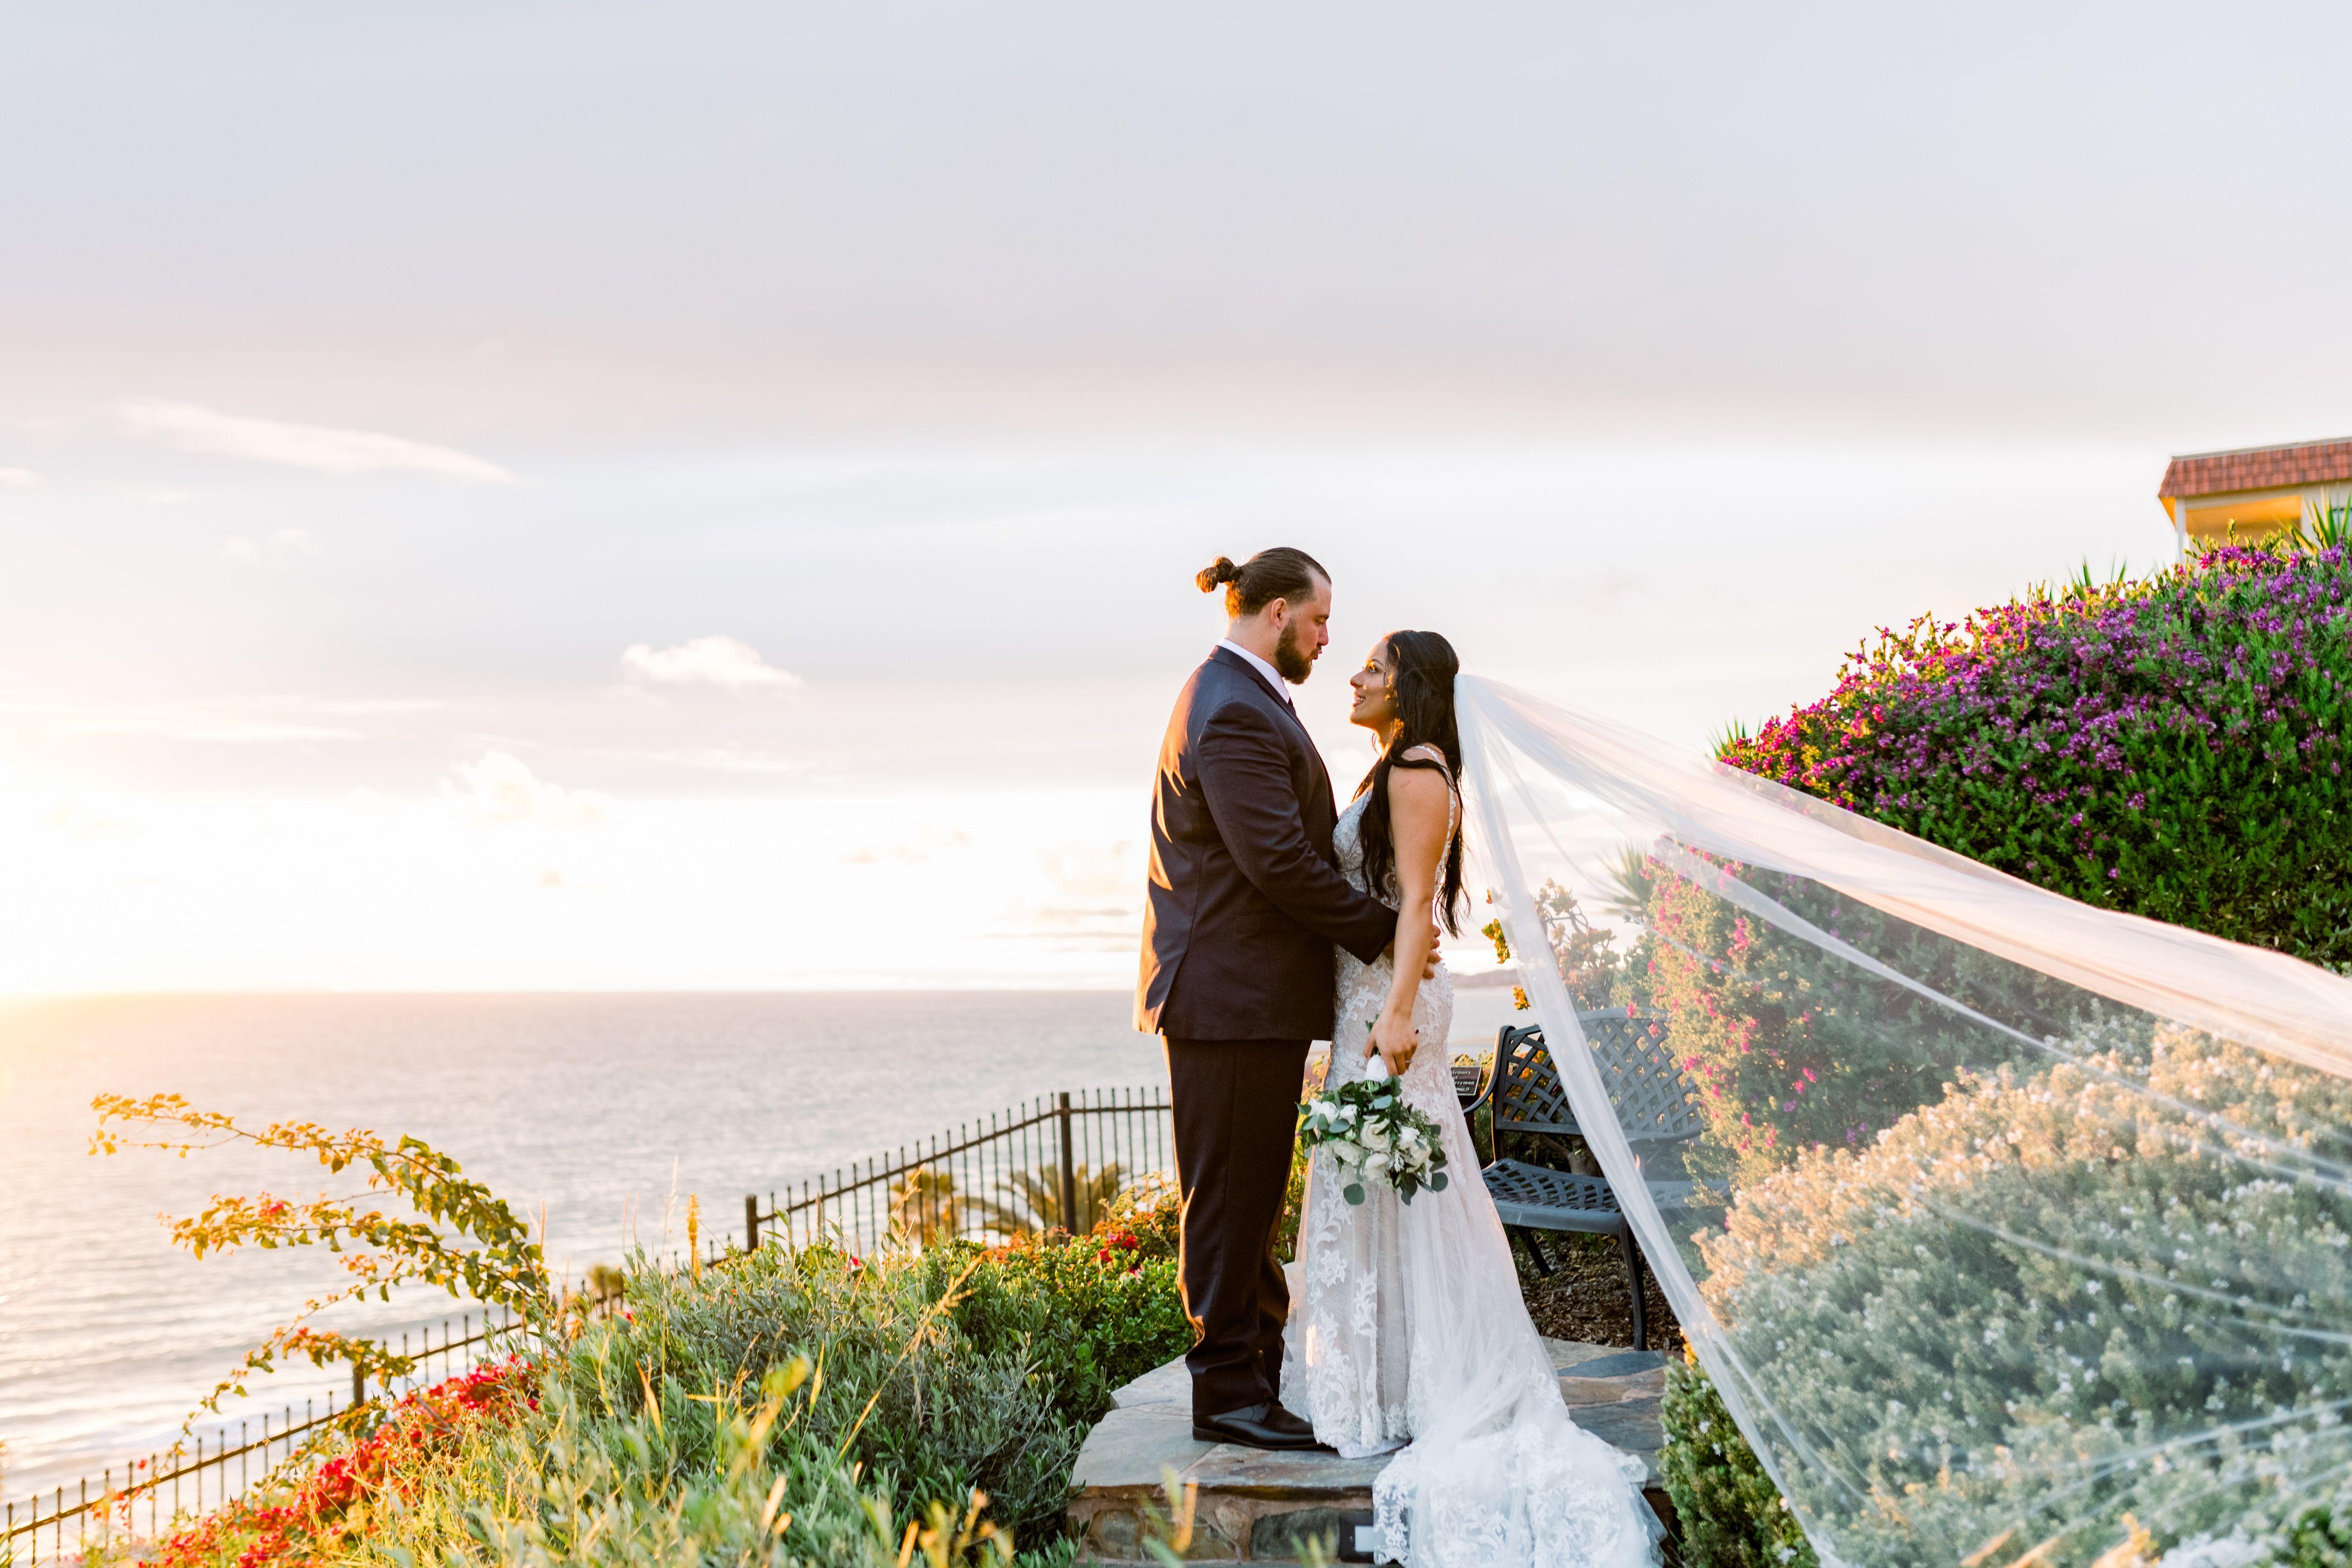 #wedding #sunset #weddingtheme #weddingcolors #weddingdress #veil #weddingoutfit #bridaloutfit #socalsunset #Oceanview #weddingbythesea #Orangecountywedding #Casaromantica #casaromanticawedding